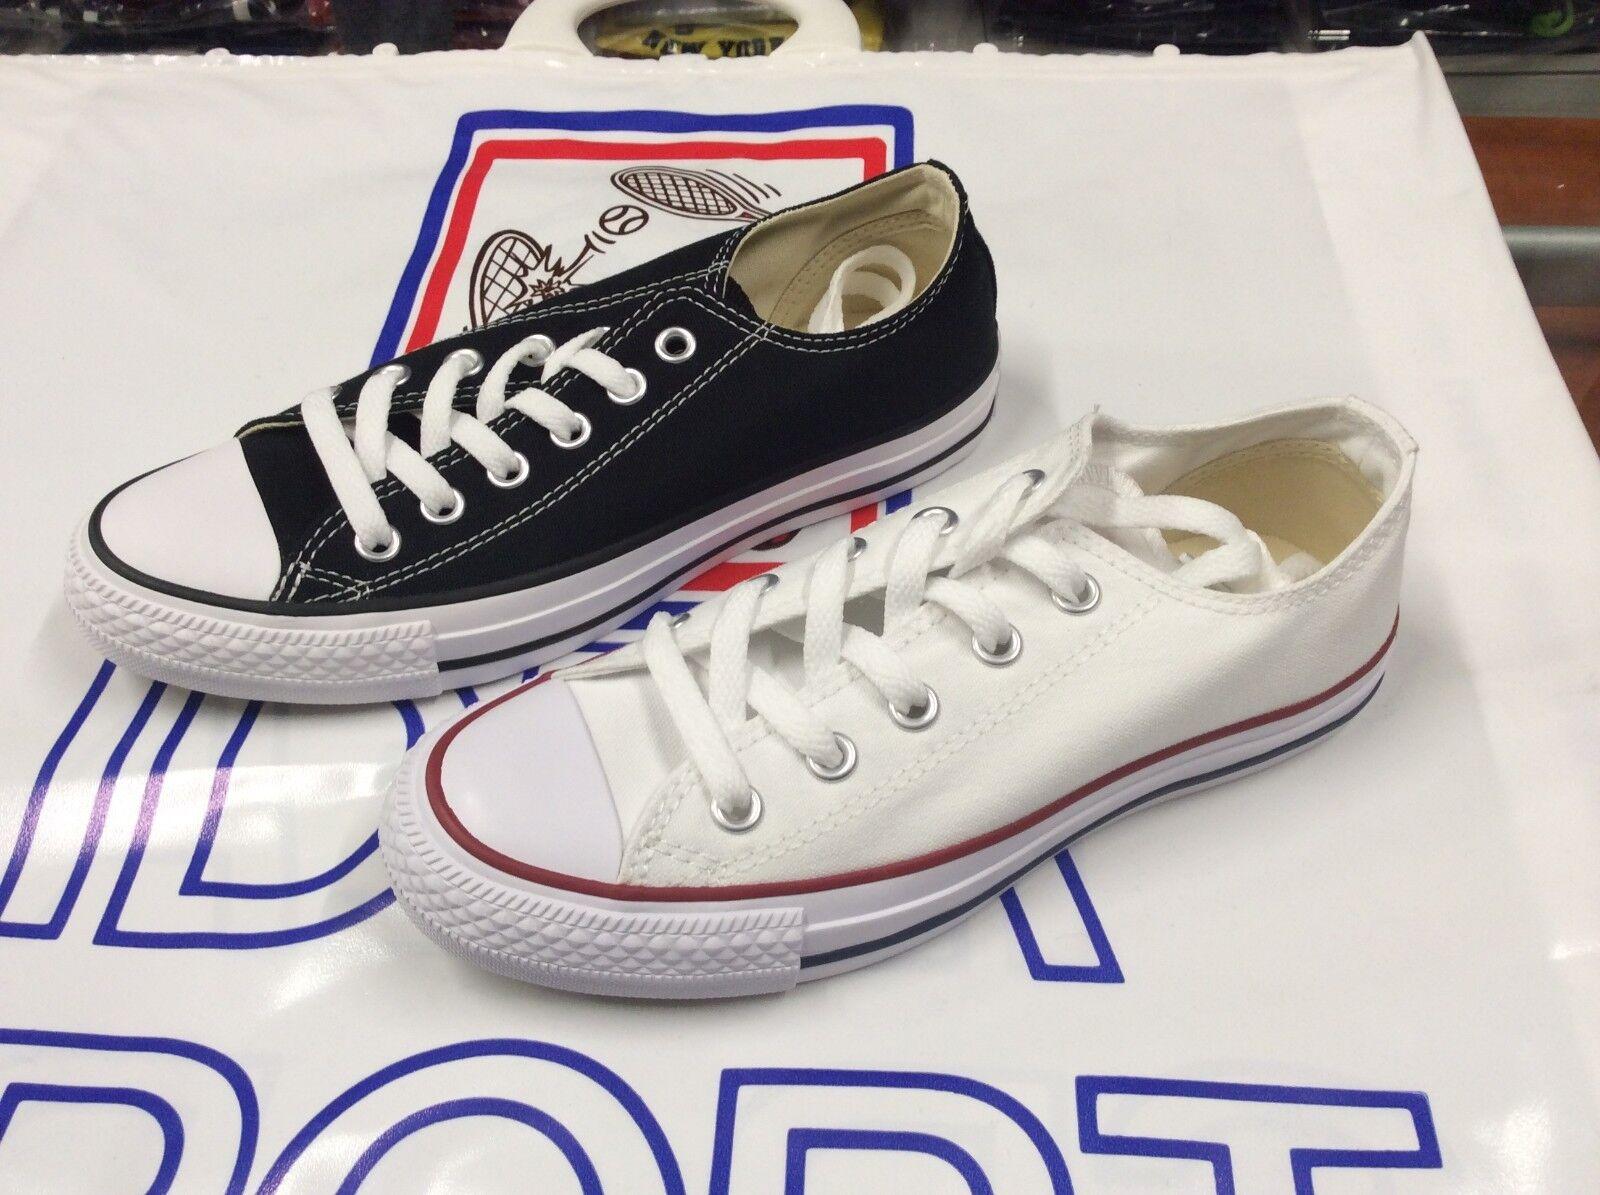 Zapatos NEGRO  UNISEX CONVERSE art. M7652C BLANCO  M9166C NEGRO Zapatos mod.ALL STAR OX LONA 71b8ba